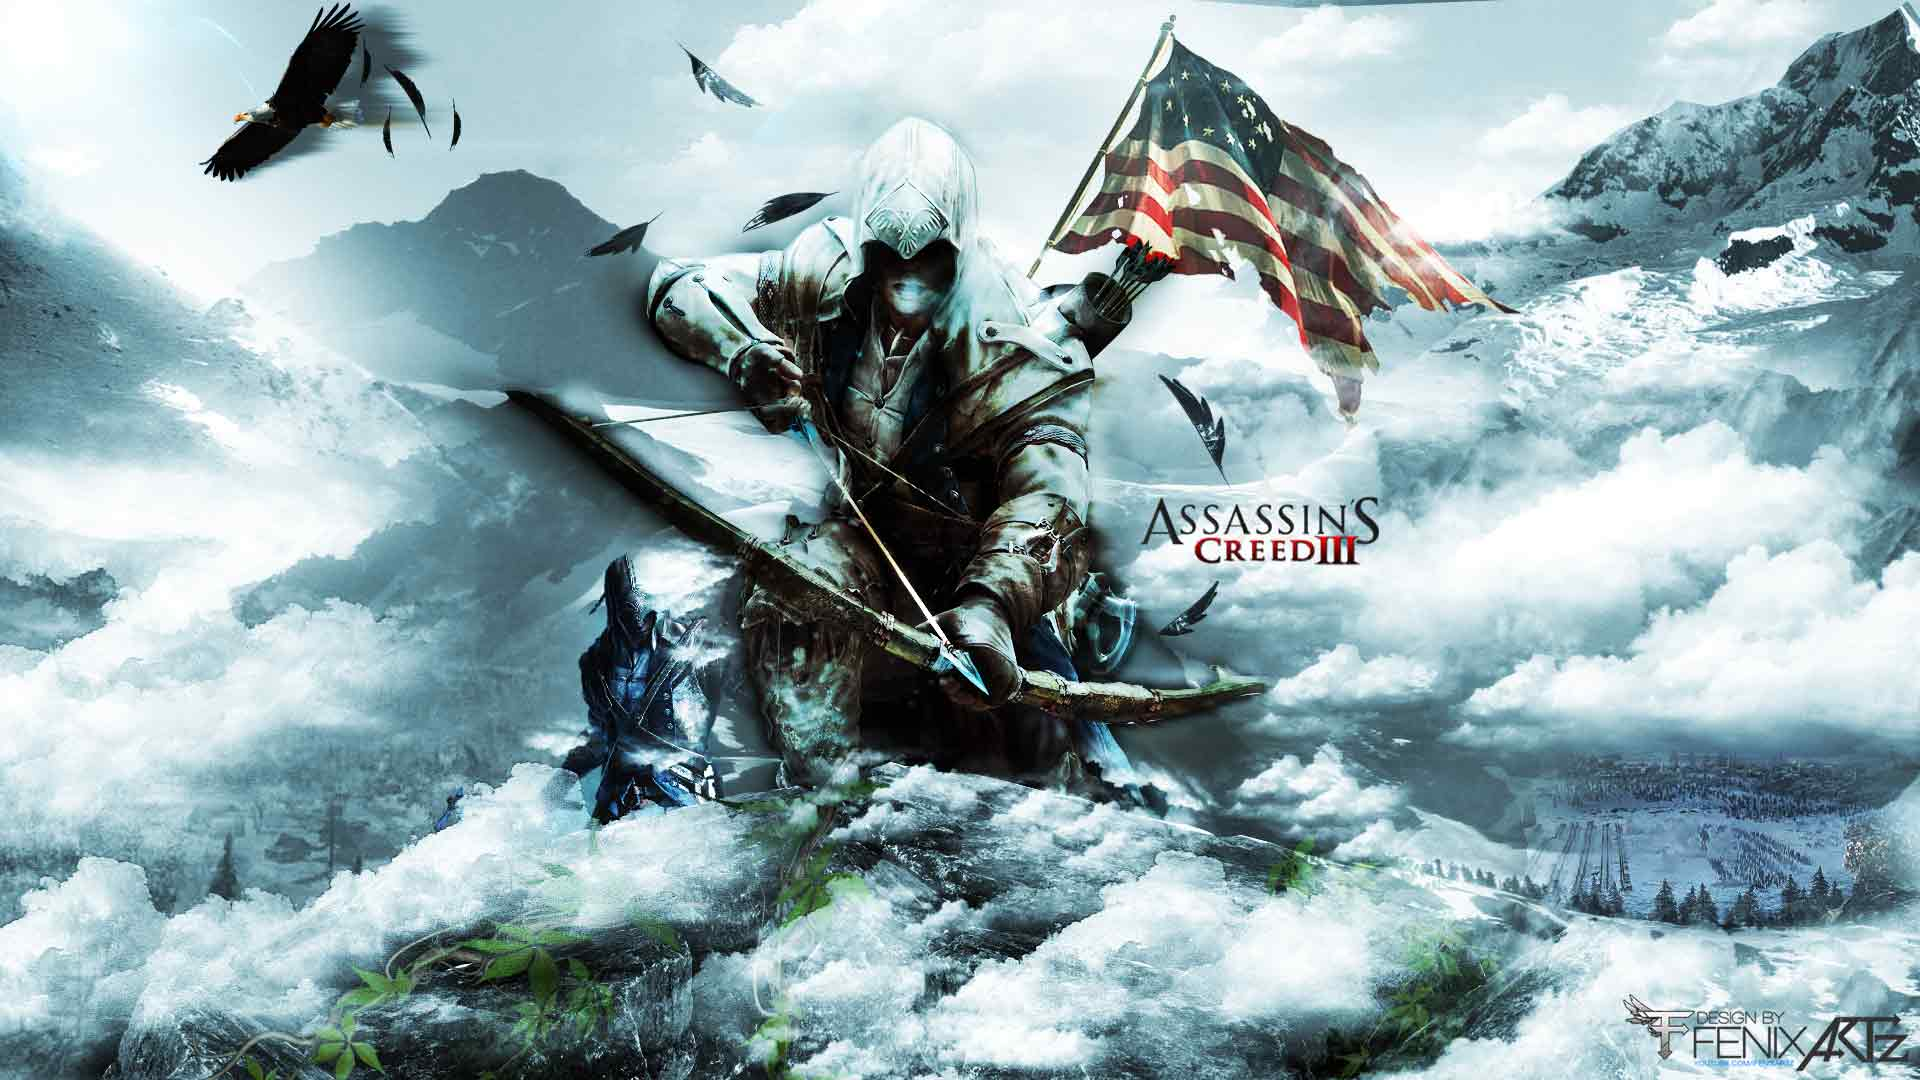 assassins creed 3 wallpaper hd